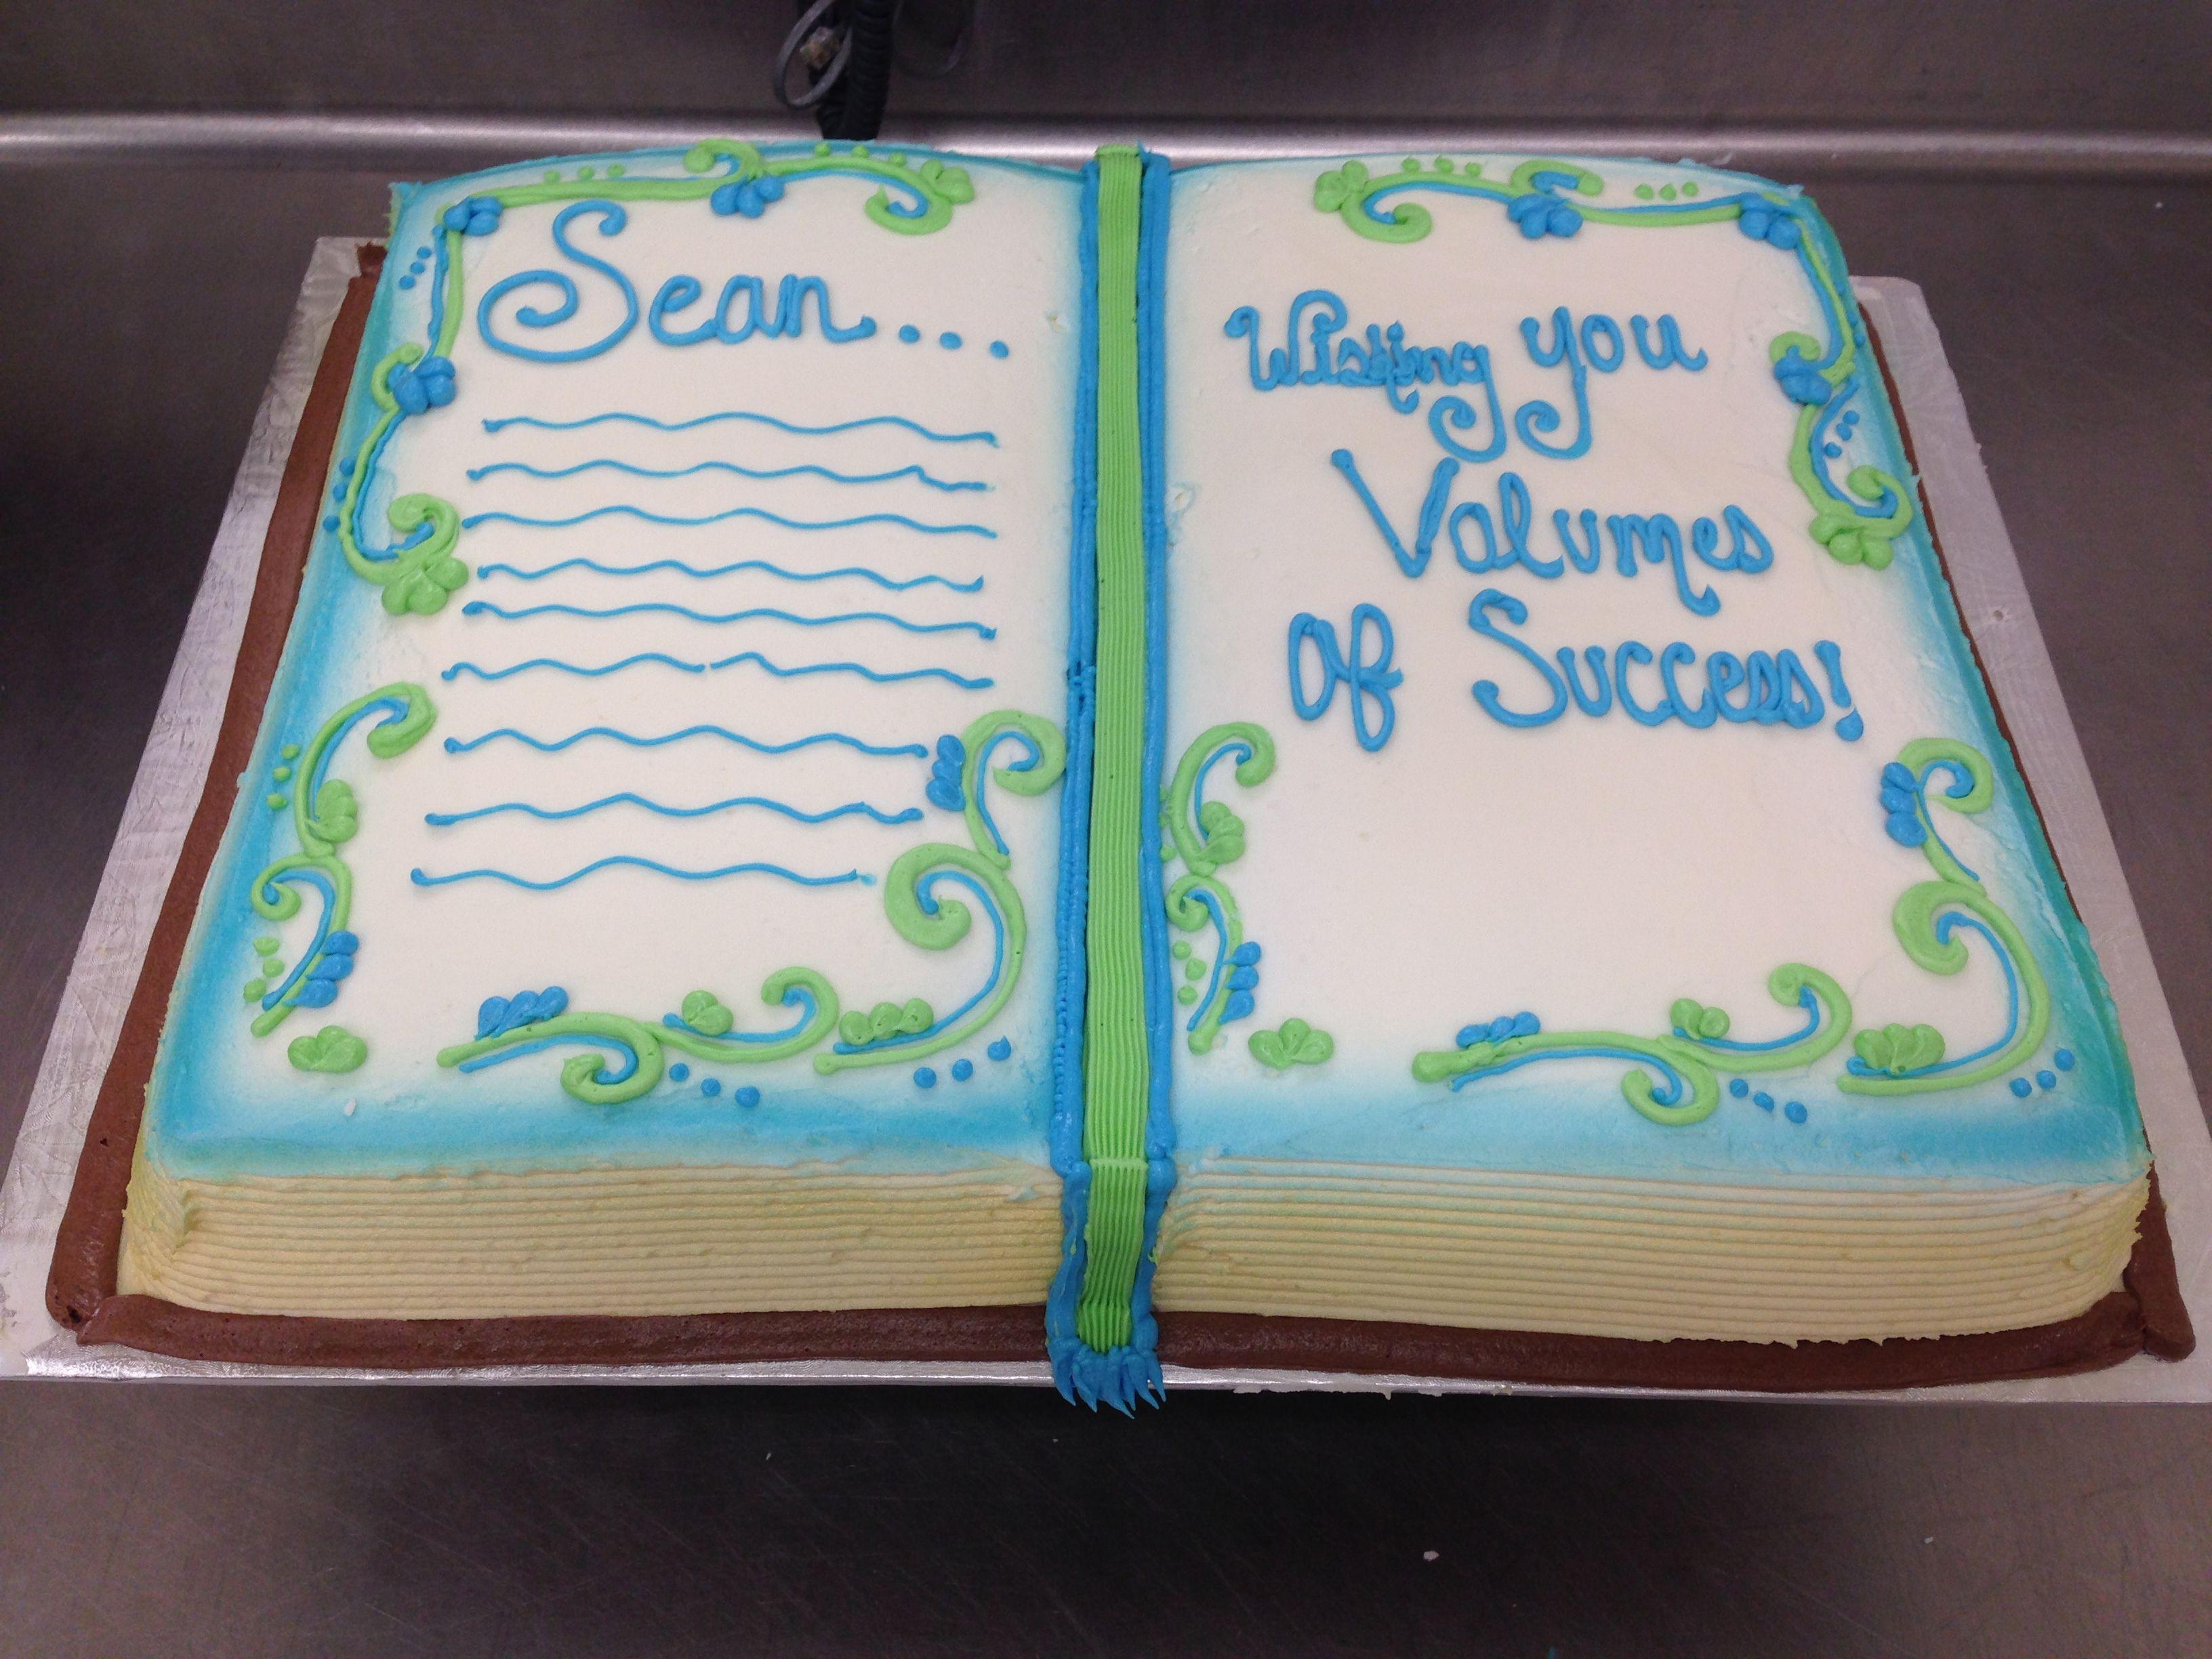 Shaped Opened Book Cake With Images Book Cake Cake Shapes Cake